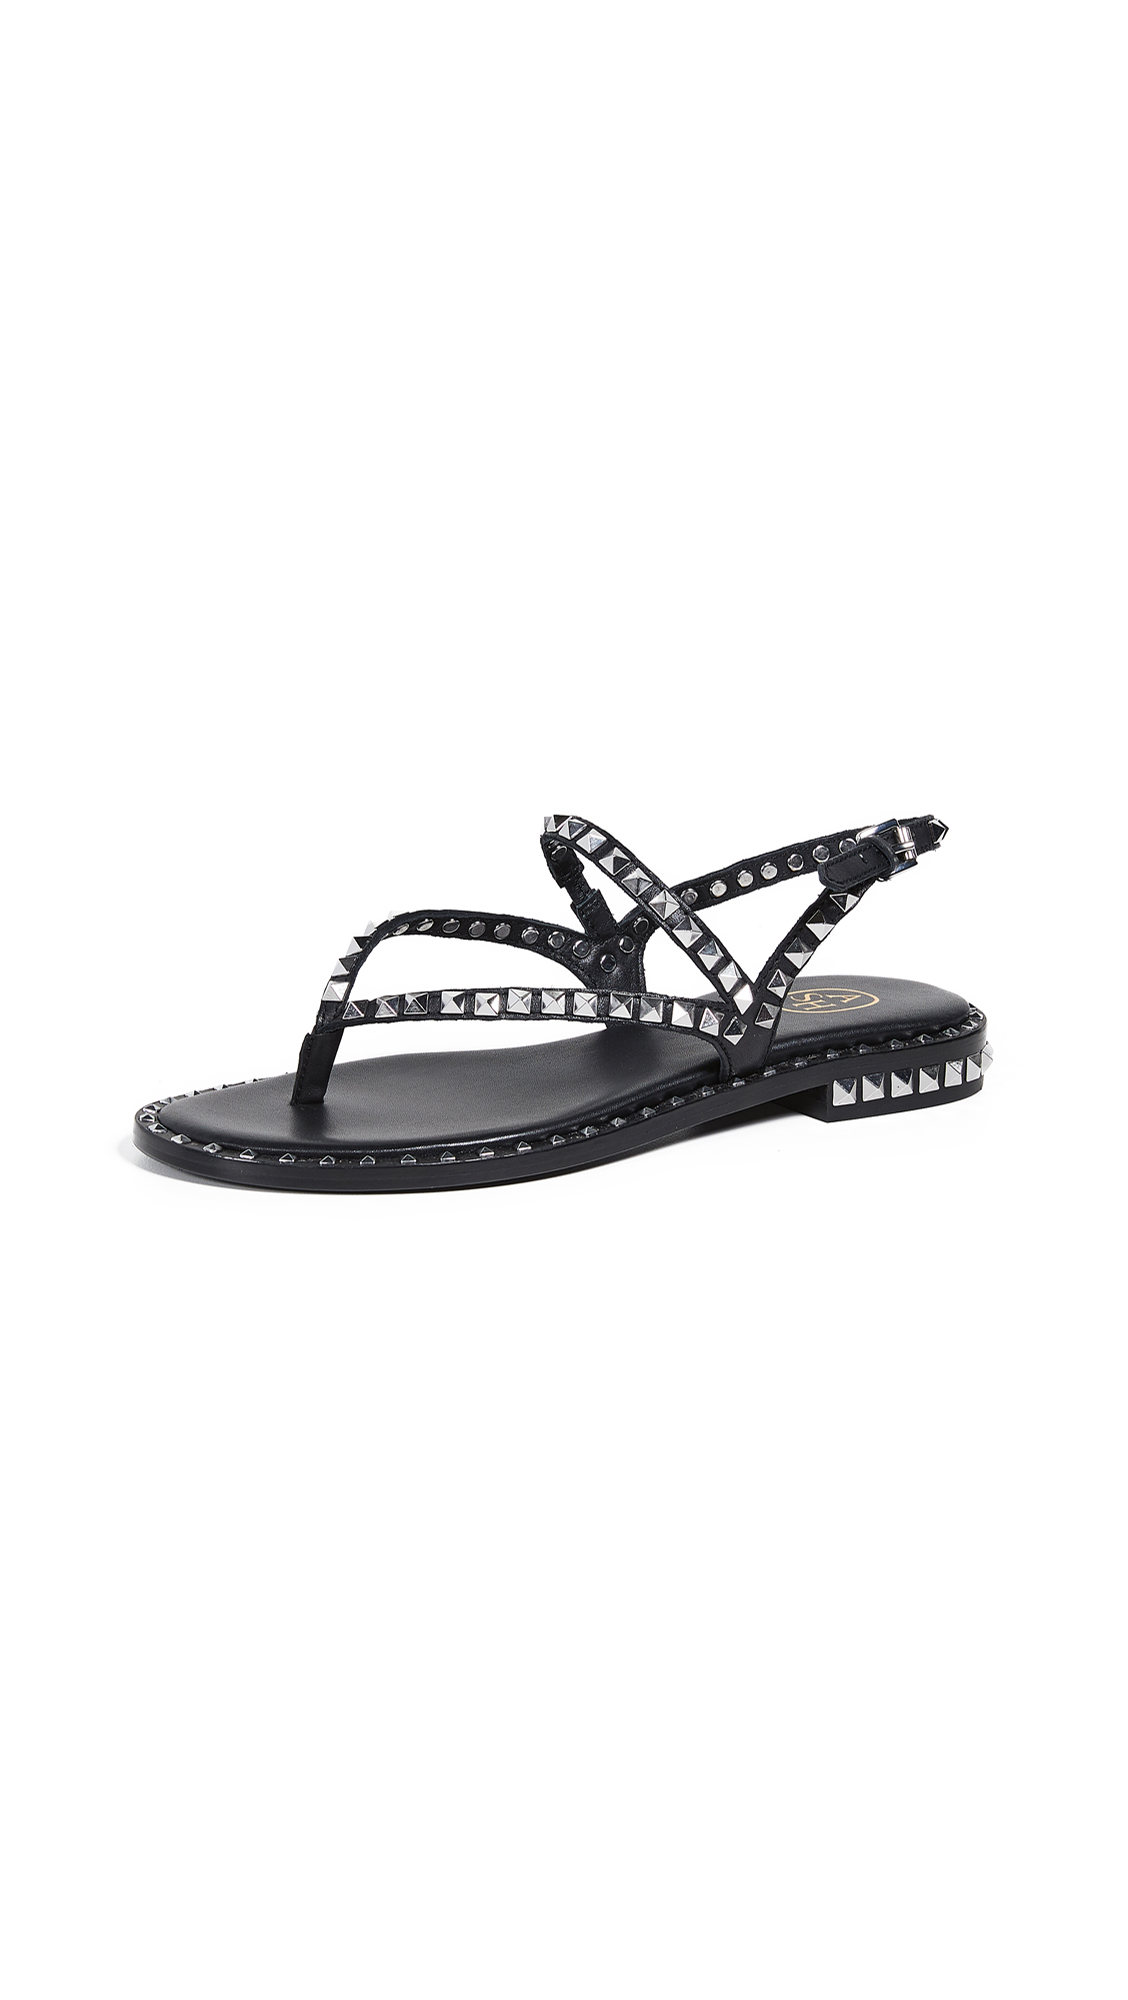 Ash Peps Thong Sandals - Black/Silver Studs